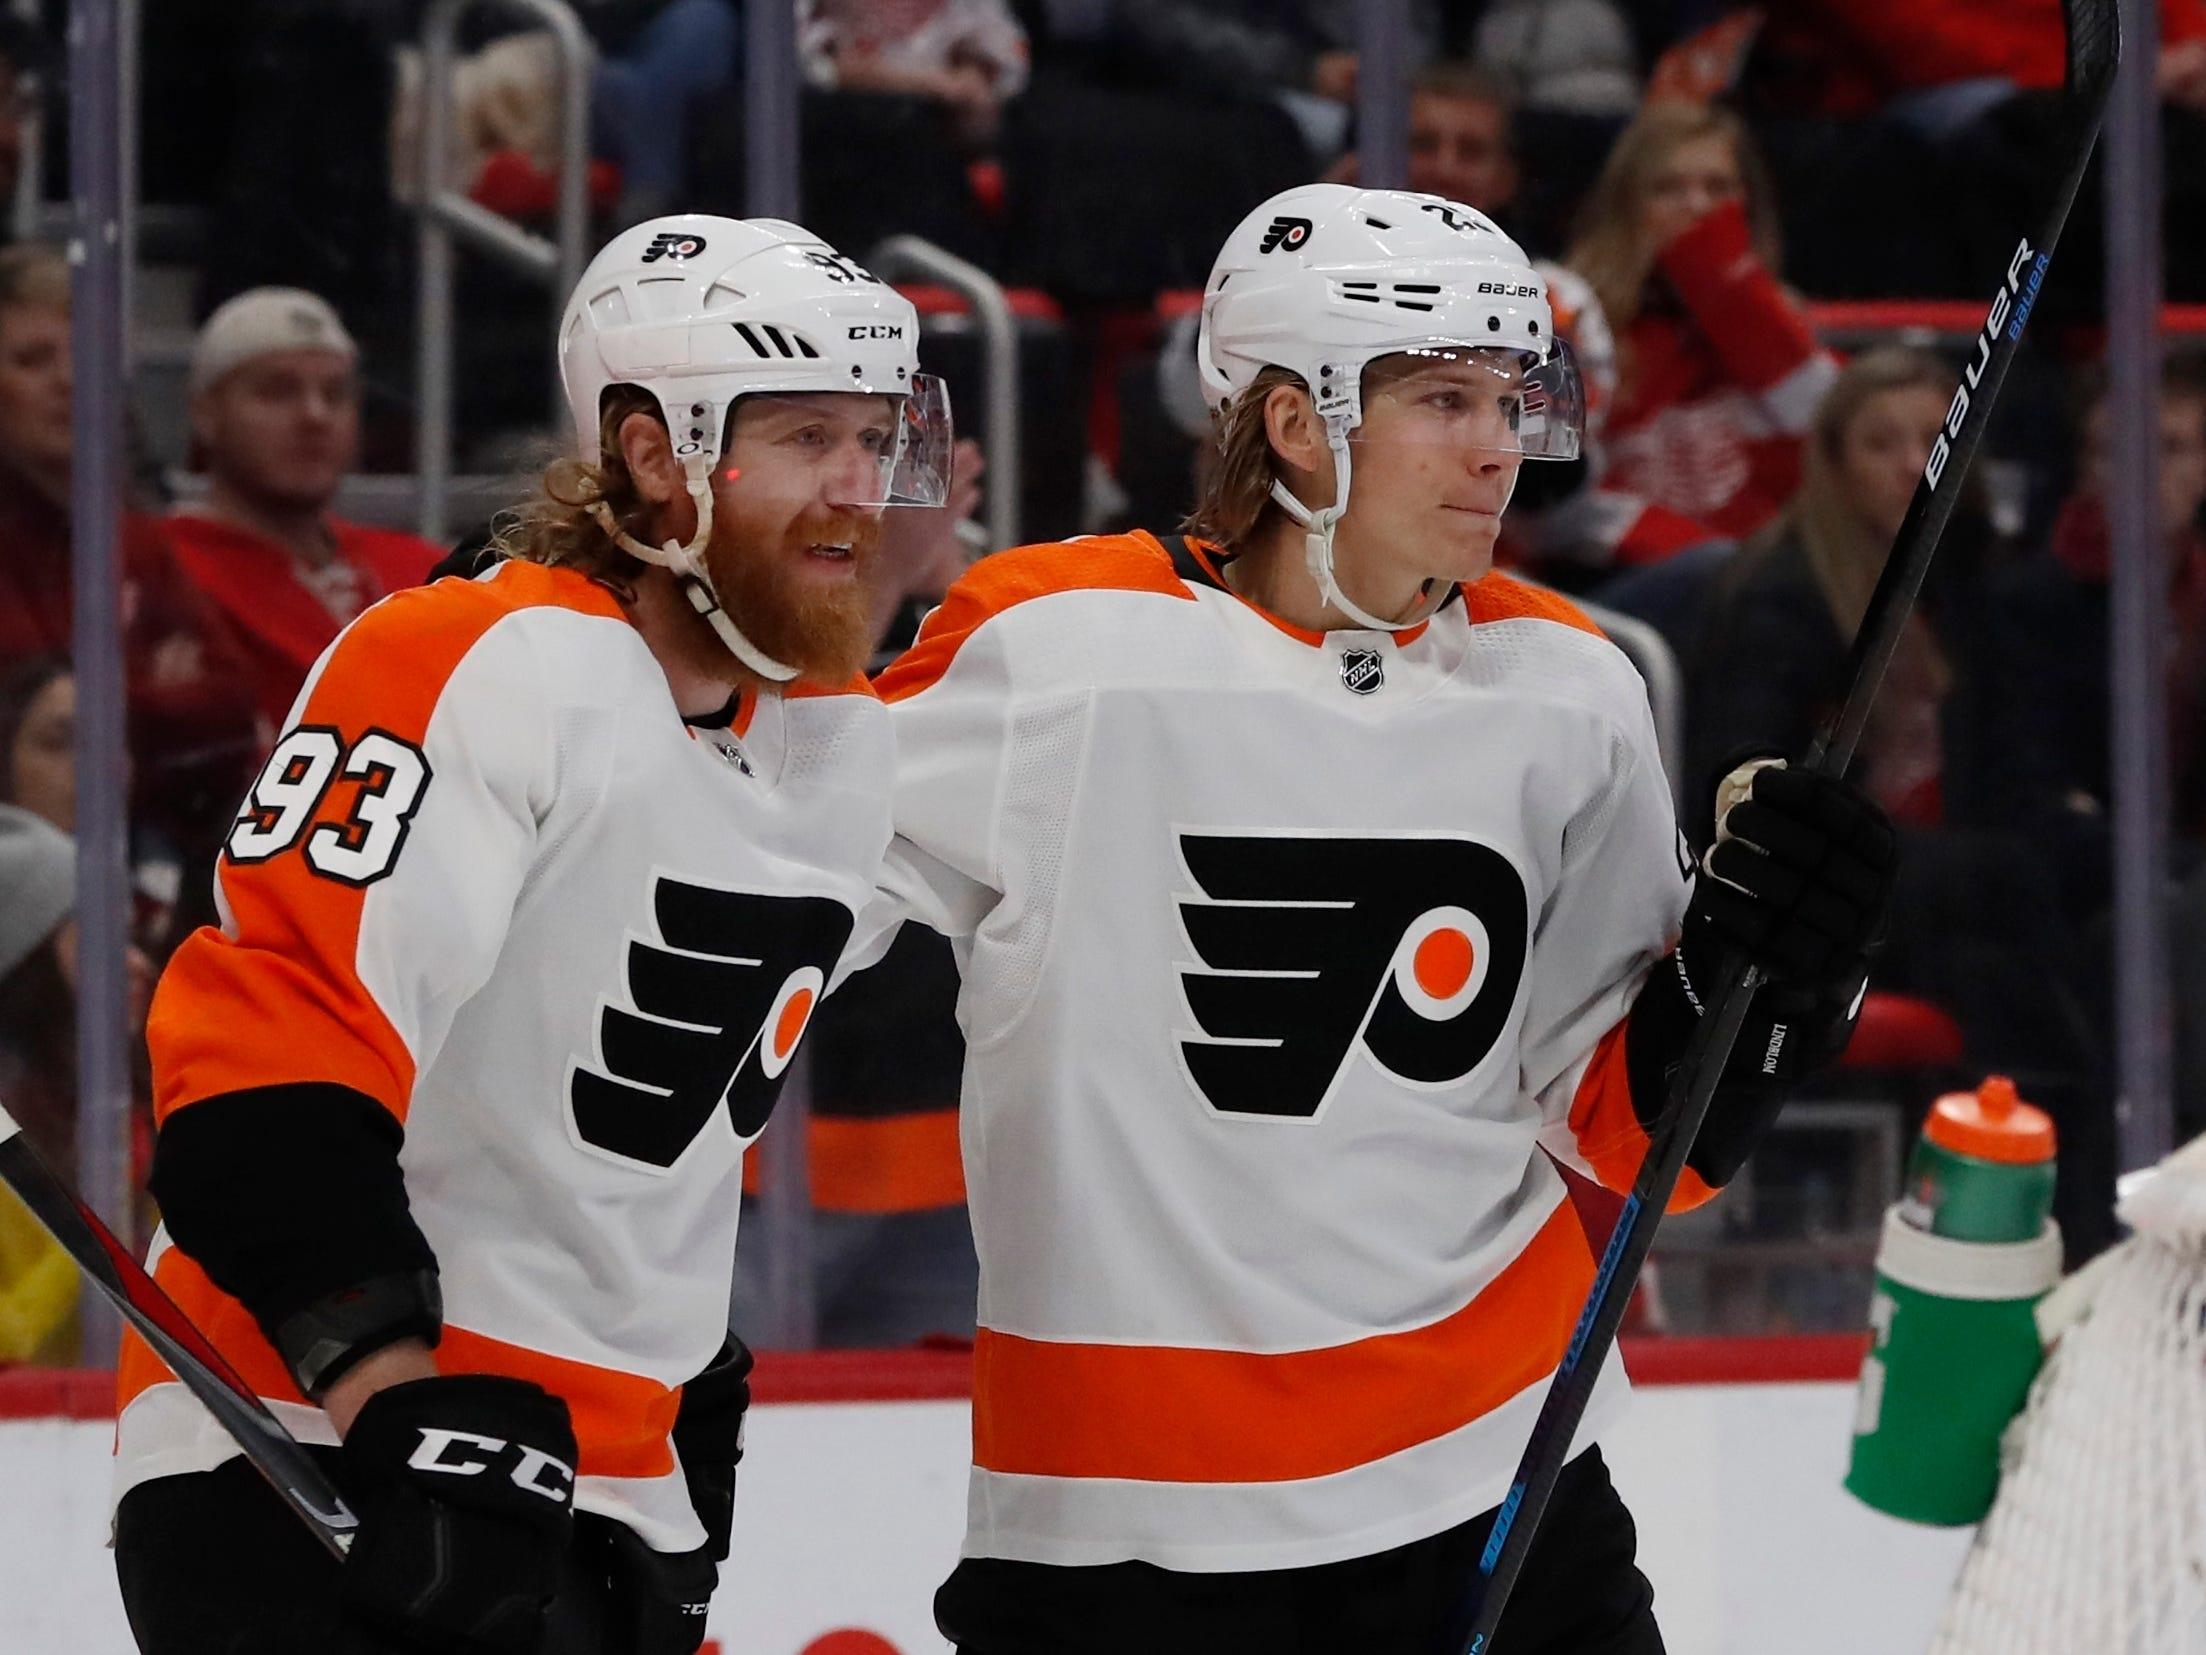 Philadelphia Flyers right wing Jakub Voracek (93) congratulates teammate  Oskar Lindblom after Lindblom's goal during the first period on Feb. 17, 2019, in Detroit.